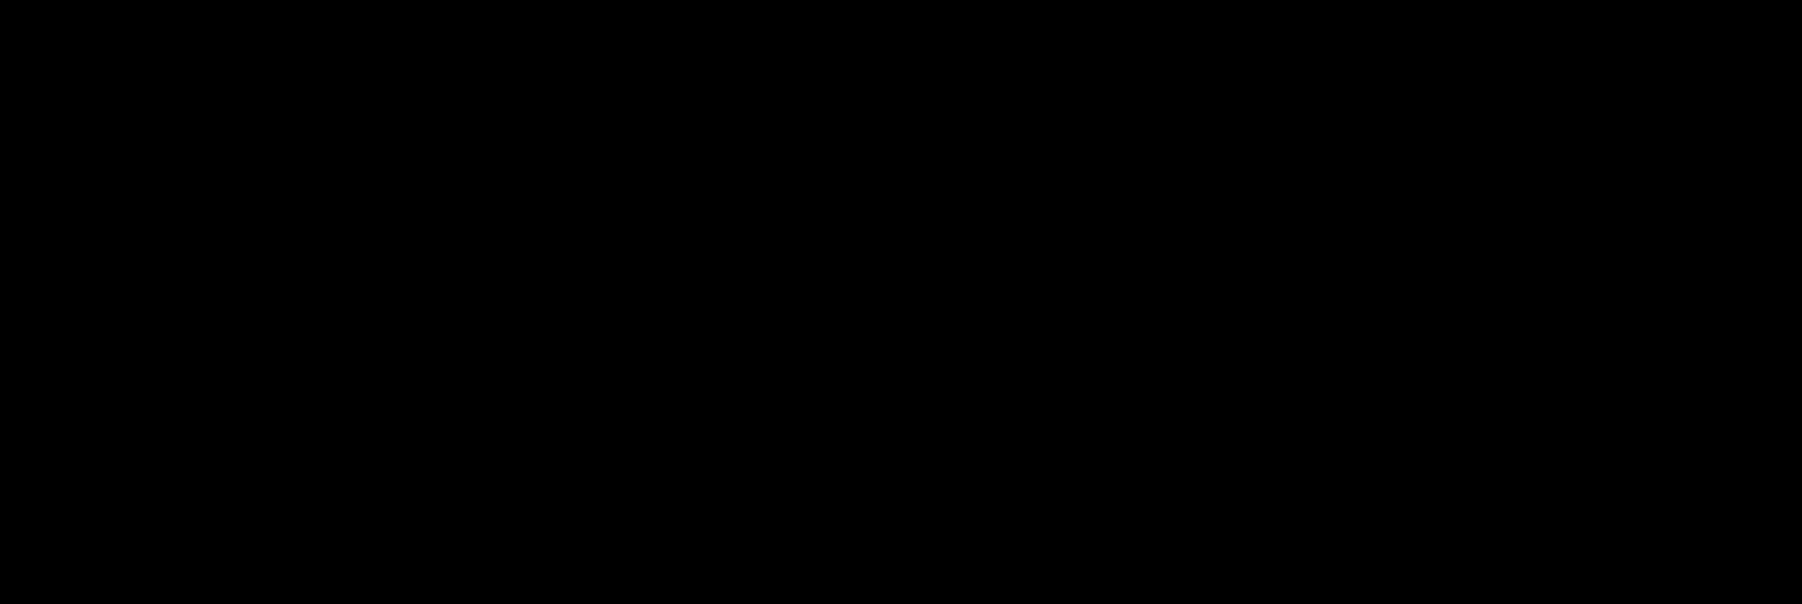 WFW logo NO BACKGROUND Black.png